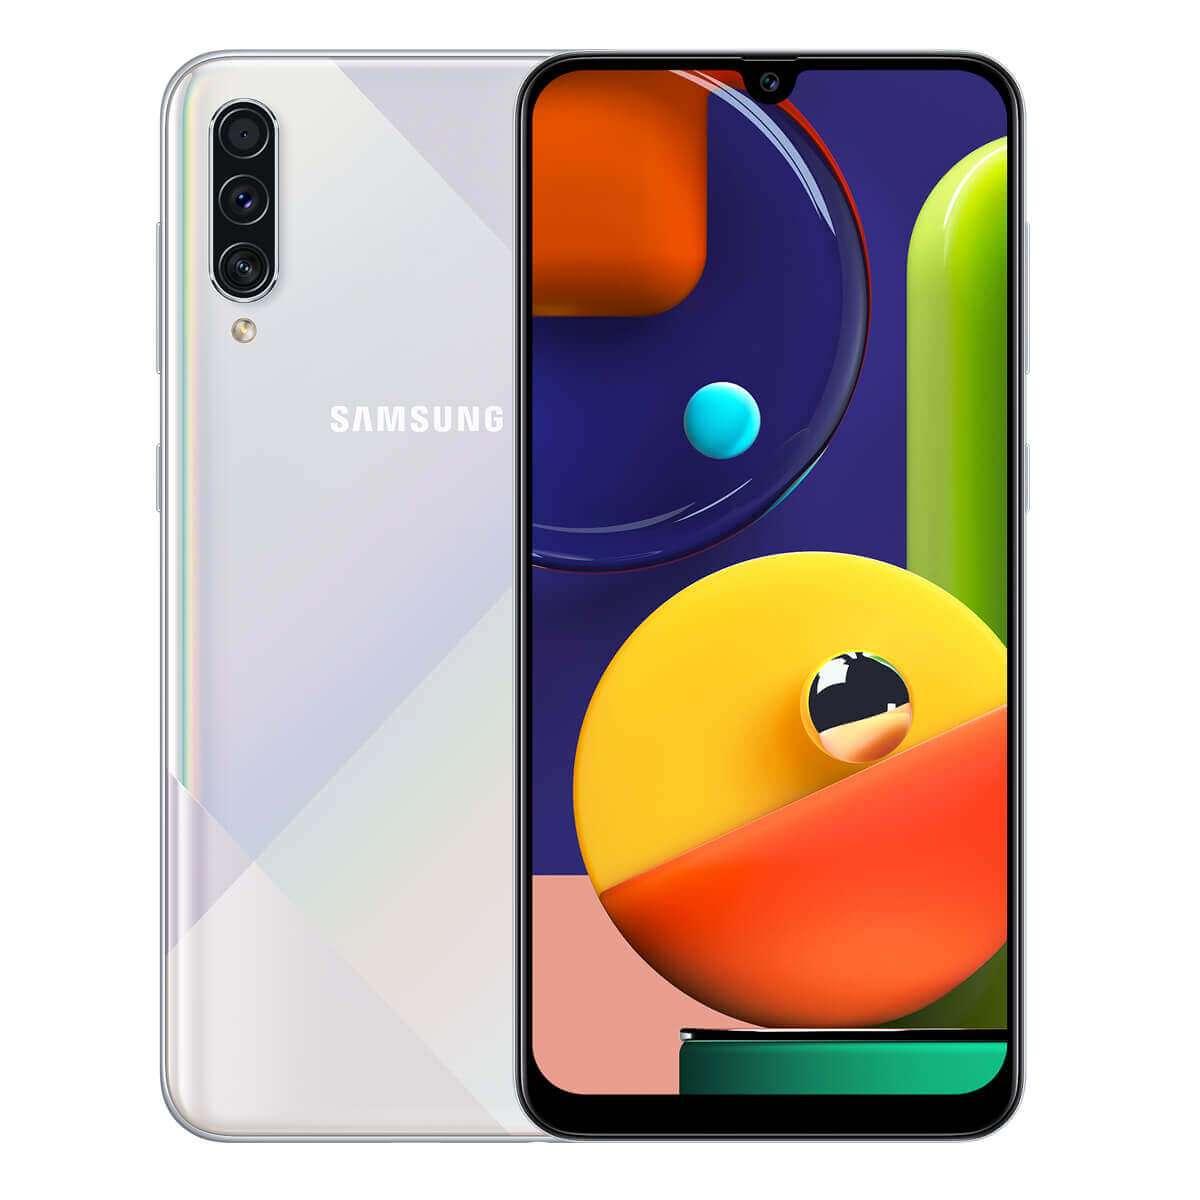 Samsung Galaxy A50s Dual Sim,128 GB, 6GB RAM,4G LTE, Prism Crush White